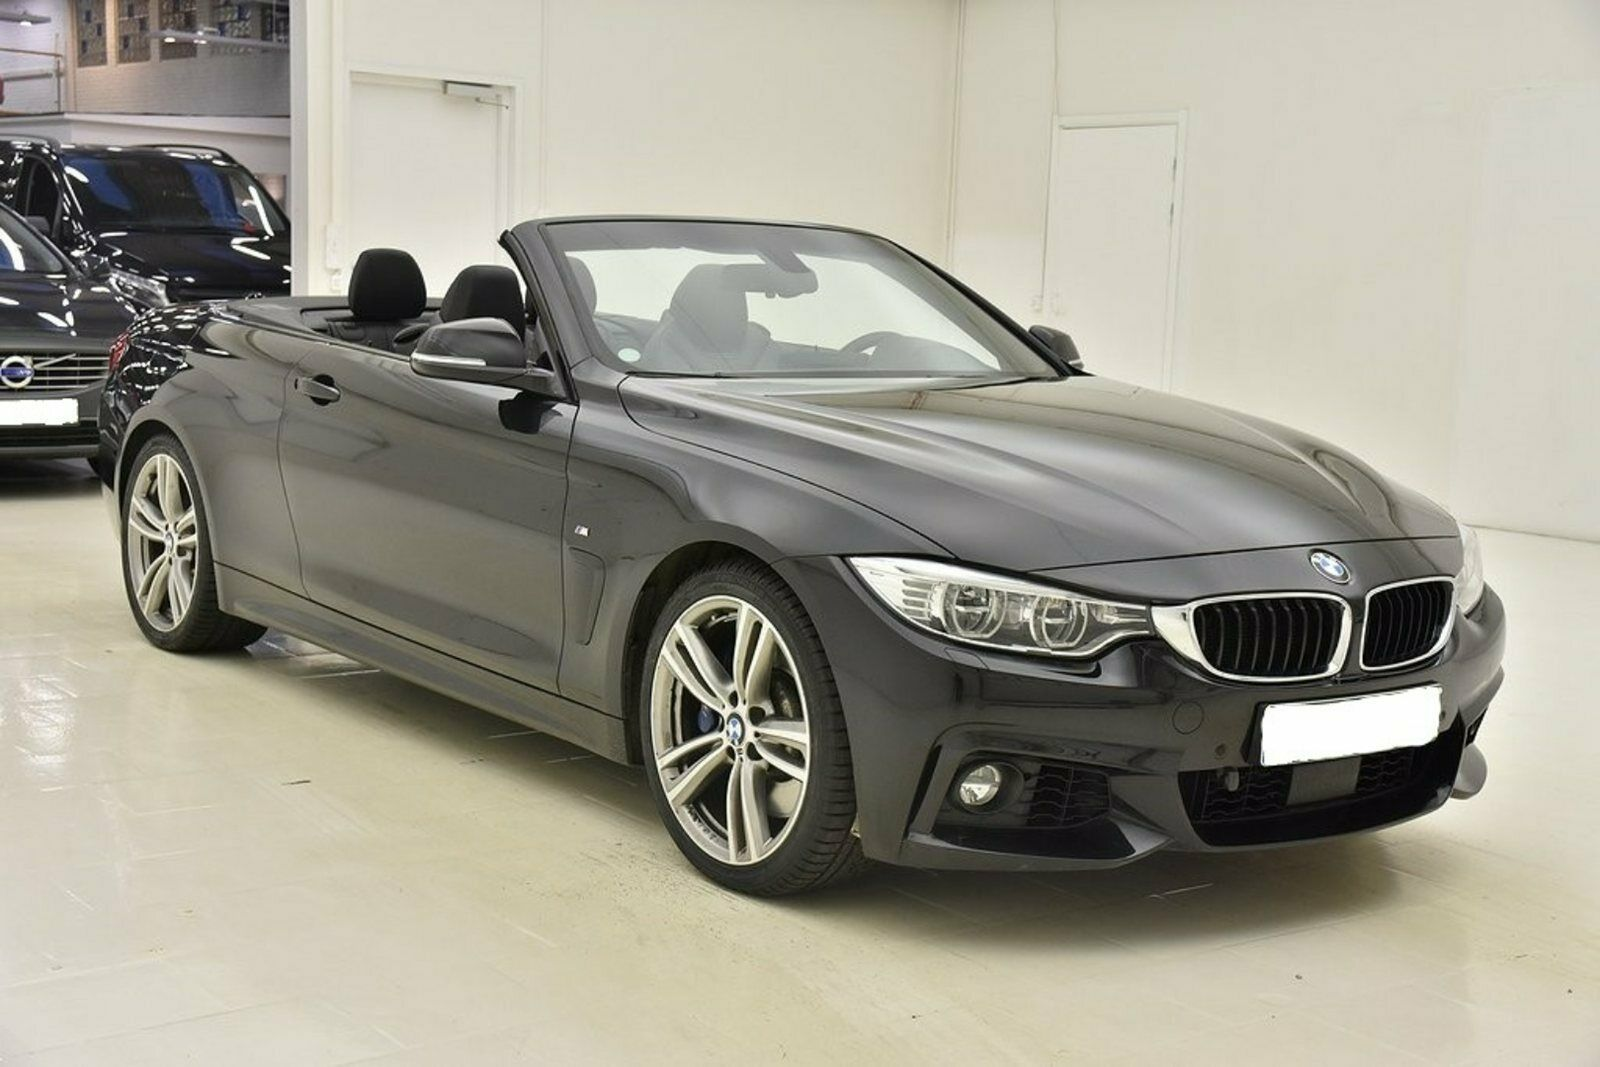 BMW 435i 3,0 Cabriolet aut. 2d - 789.000 kr.